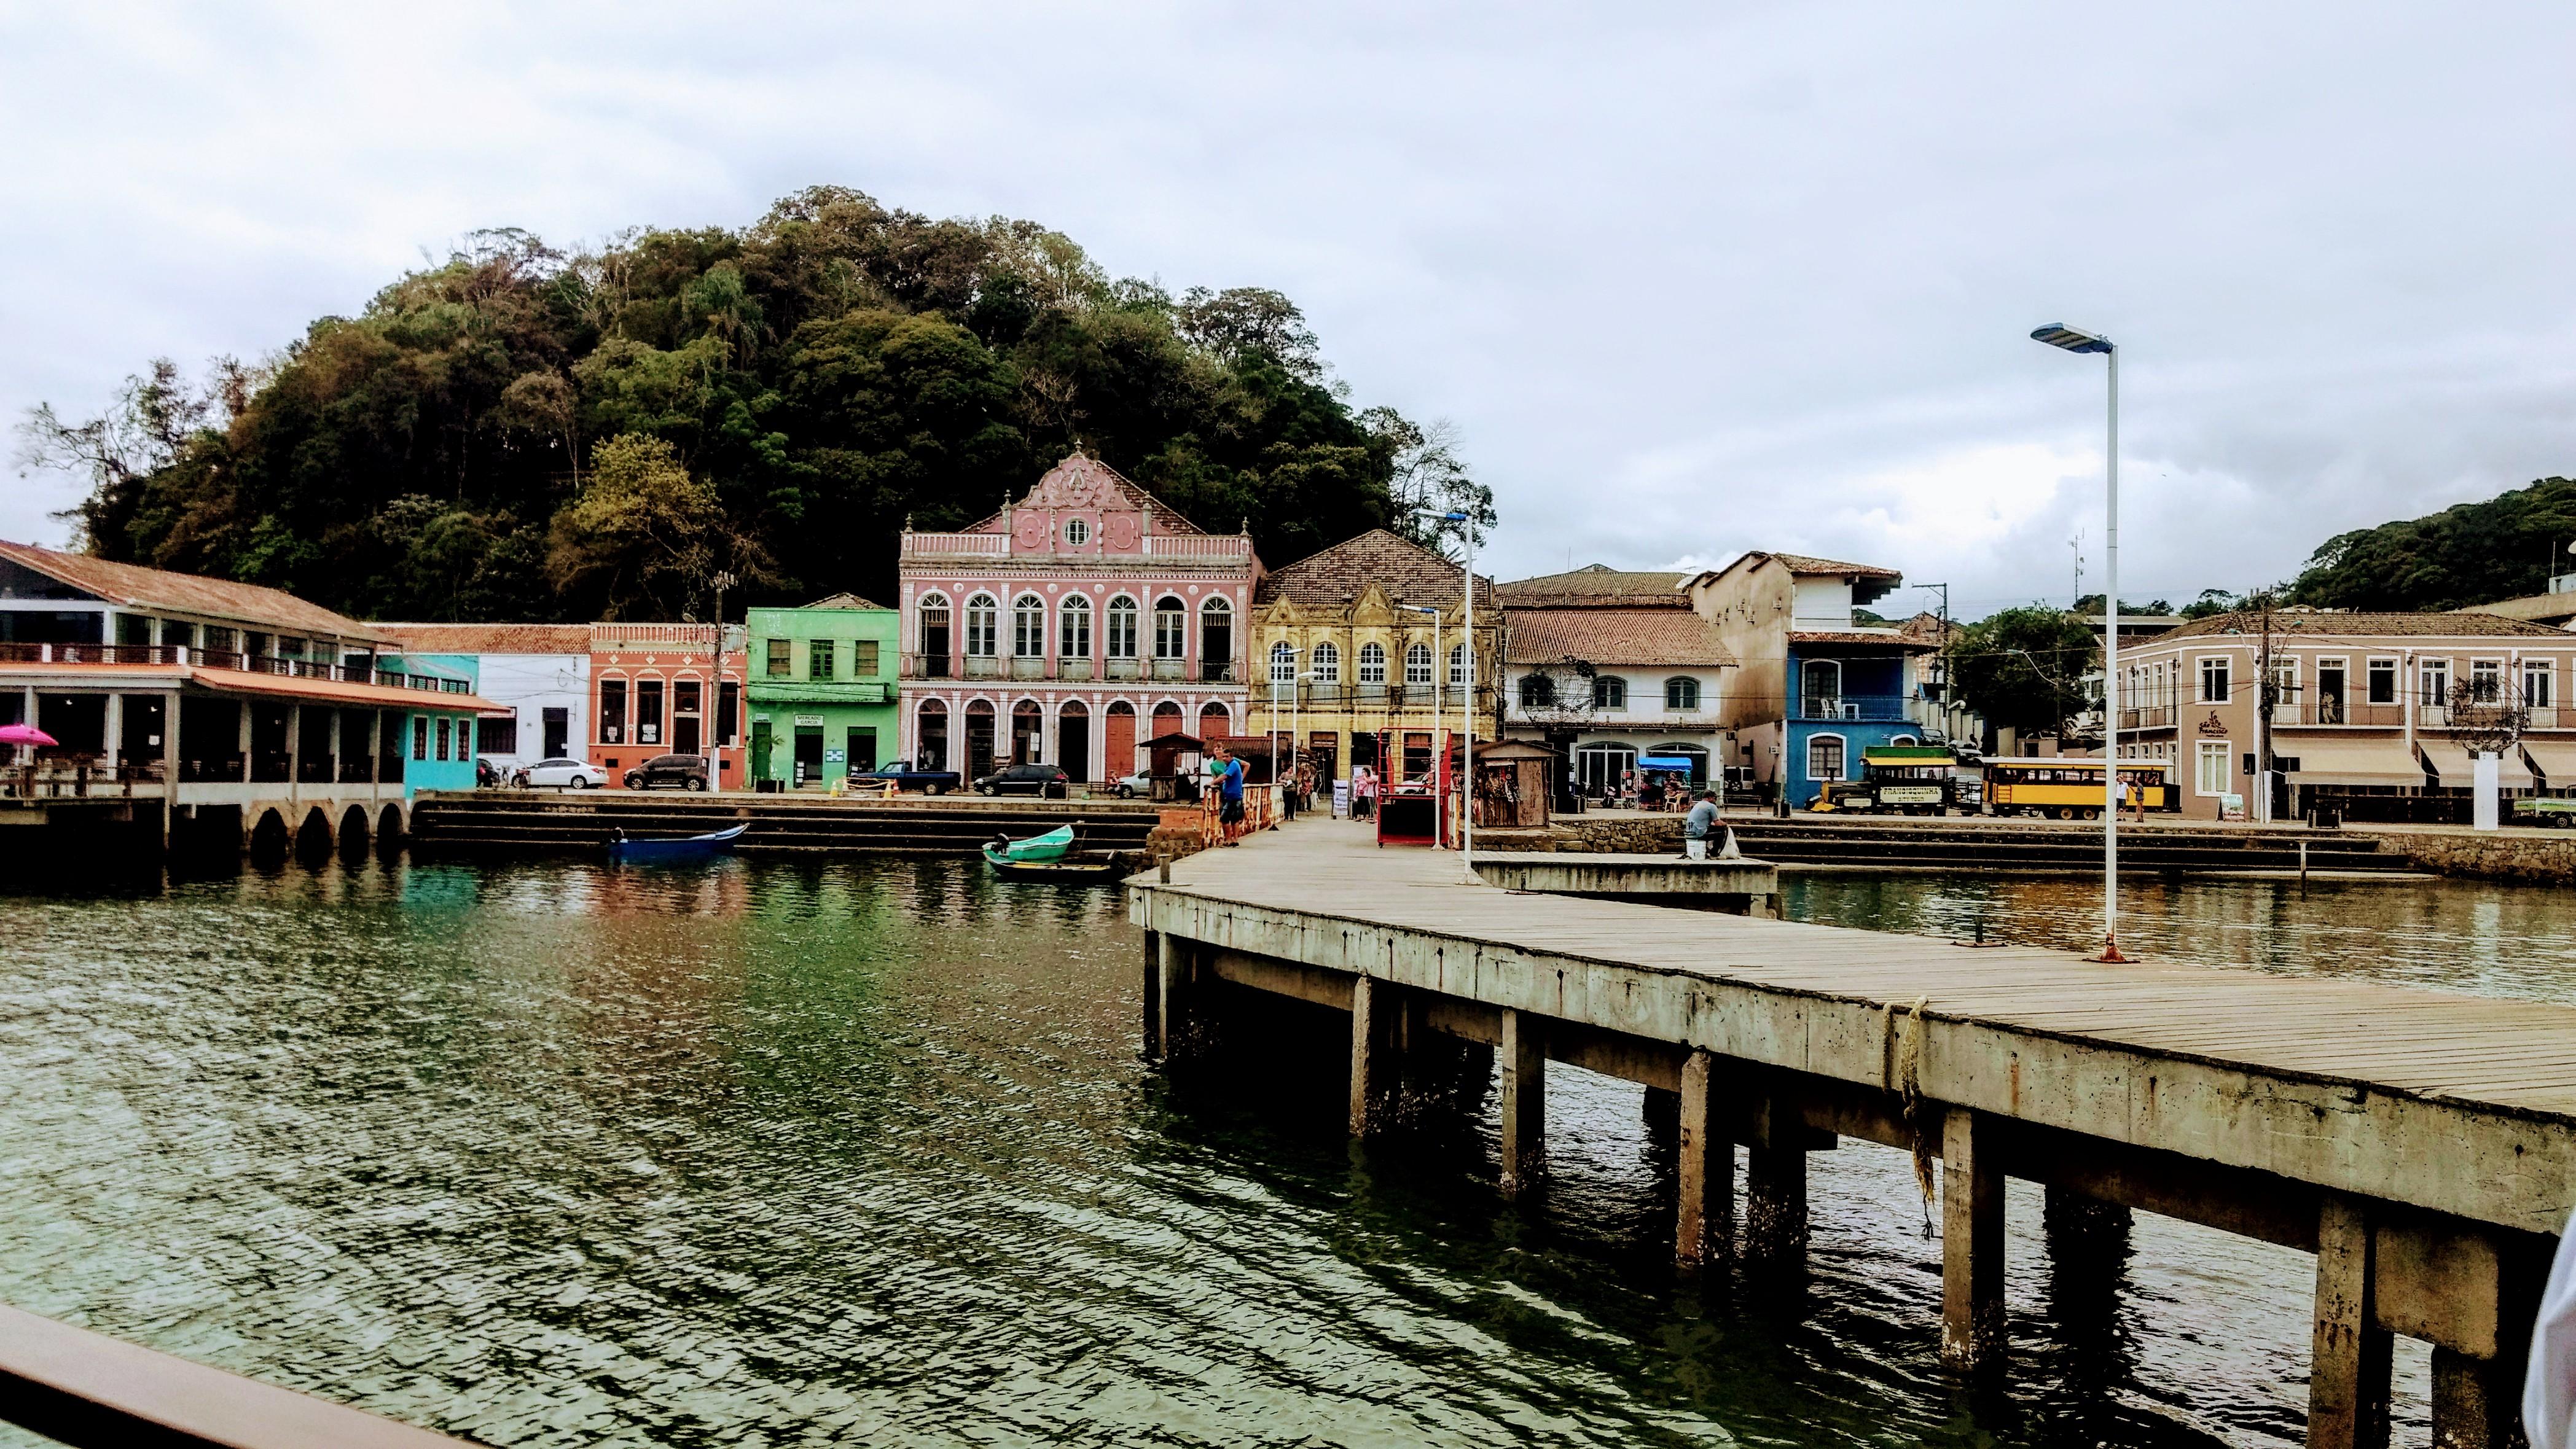 São Francisco do Sul Santa Catarina fonte: upload.wikimedia.org